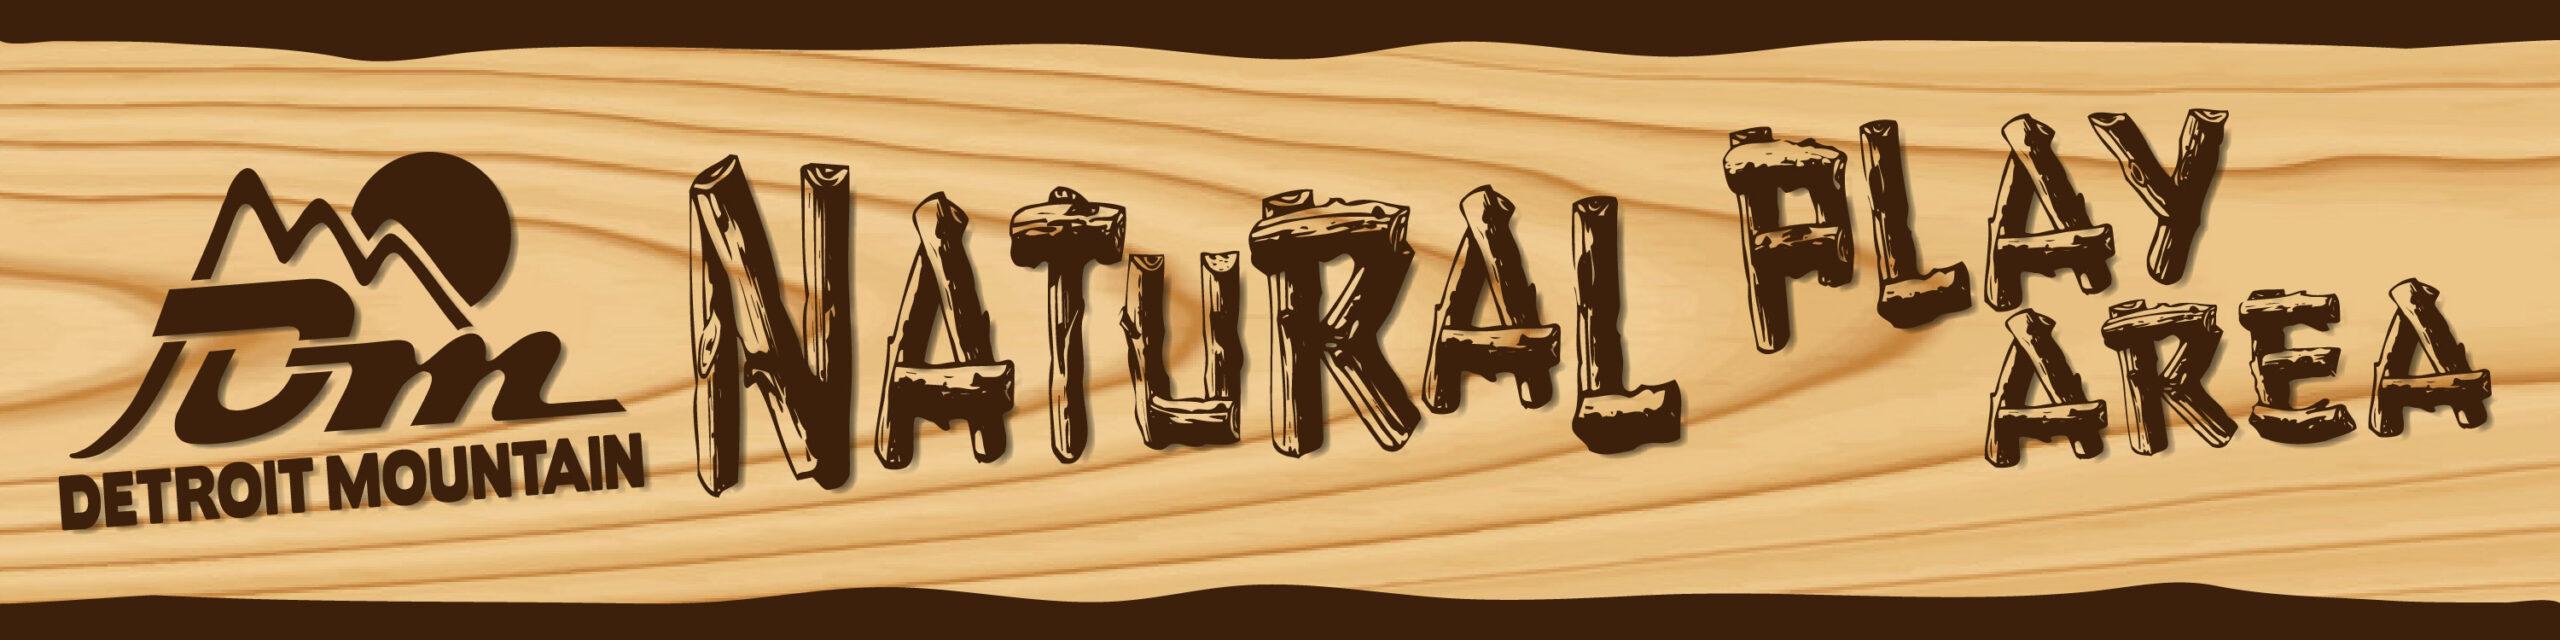 NAT-PLAY-AREA-01